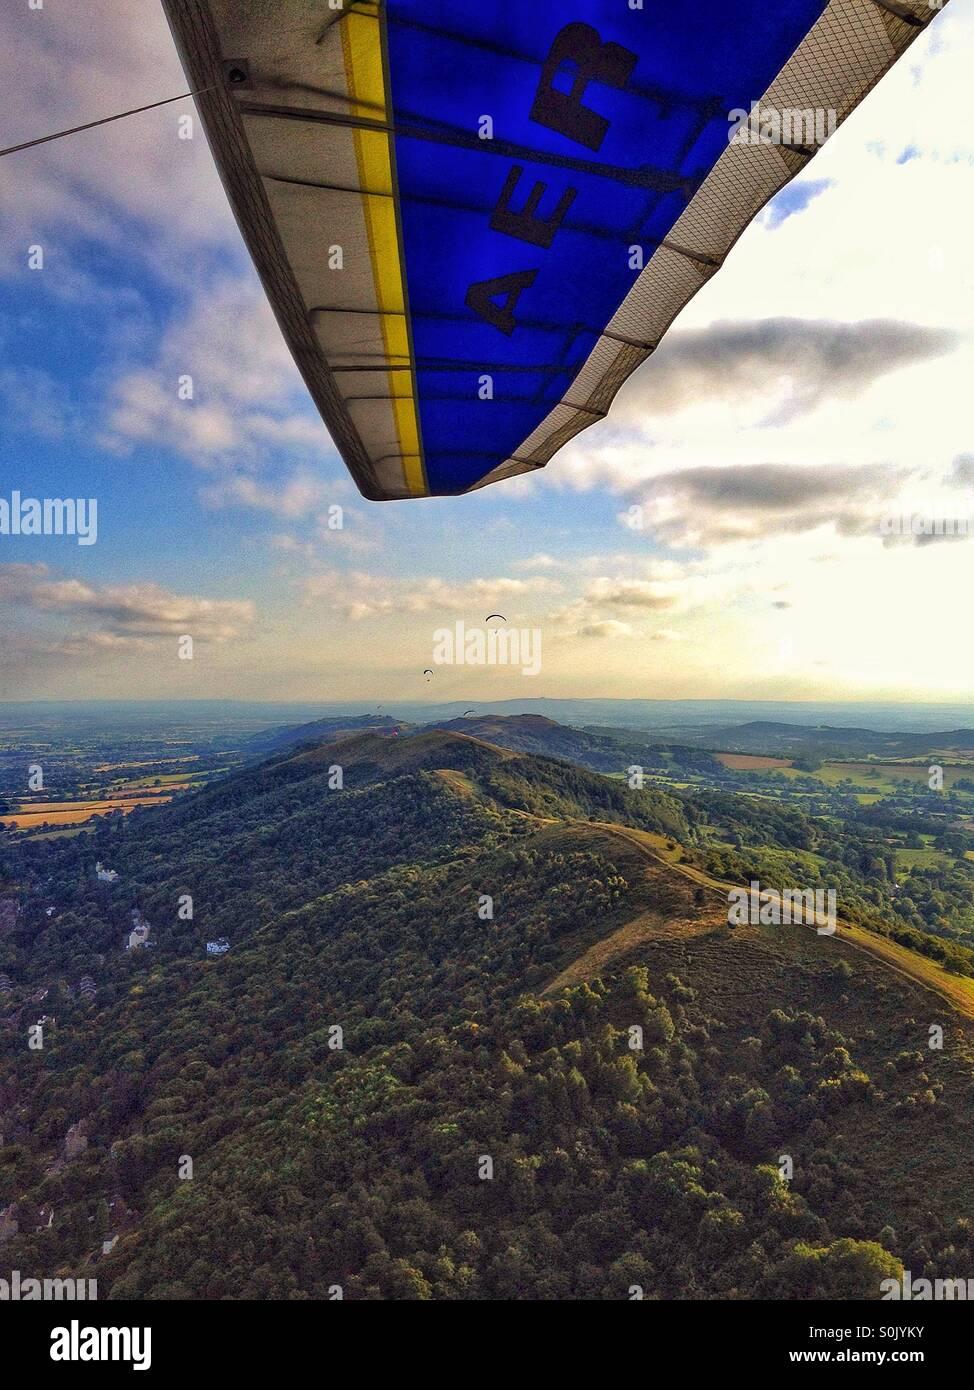 Hang gliding above the Malverns - Stock Image